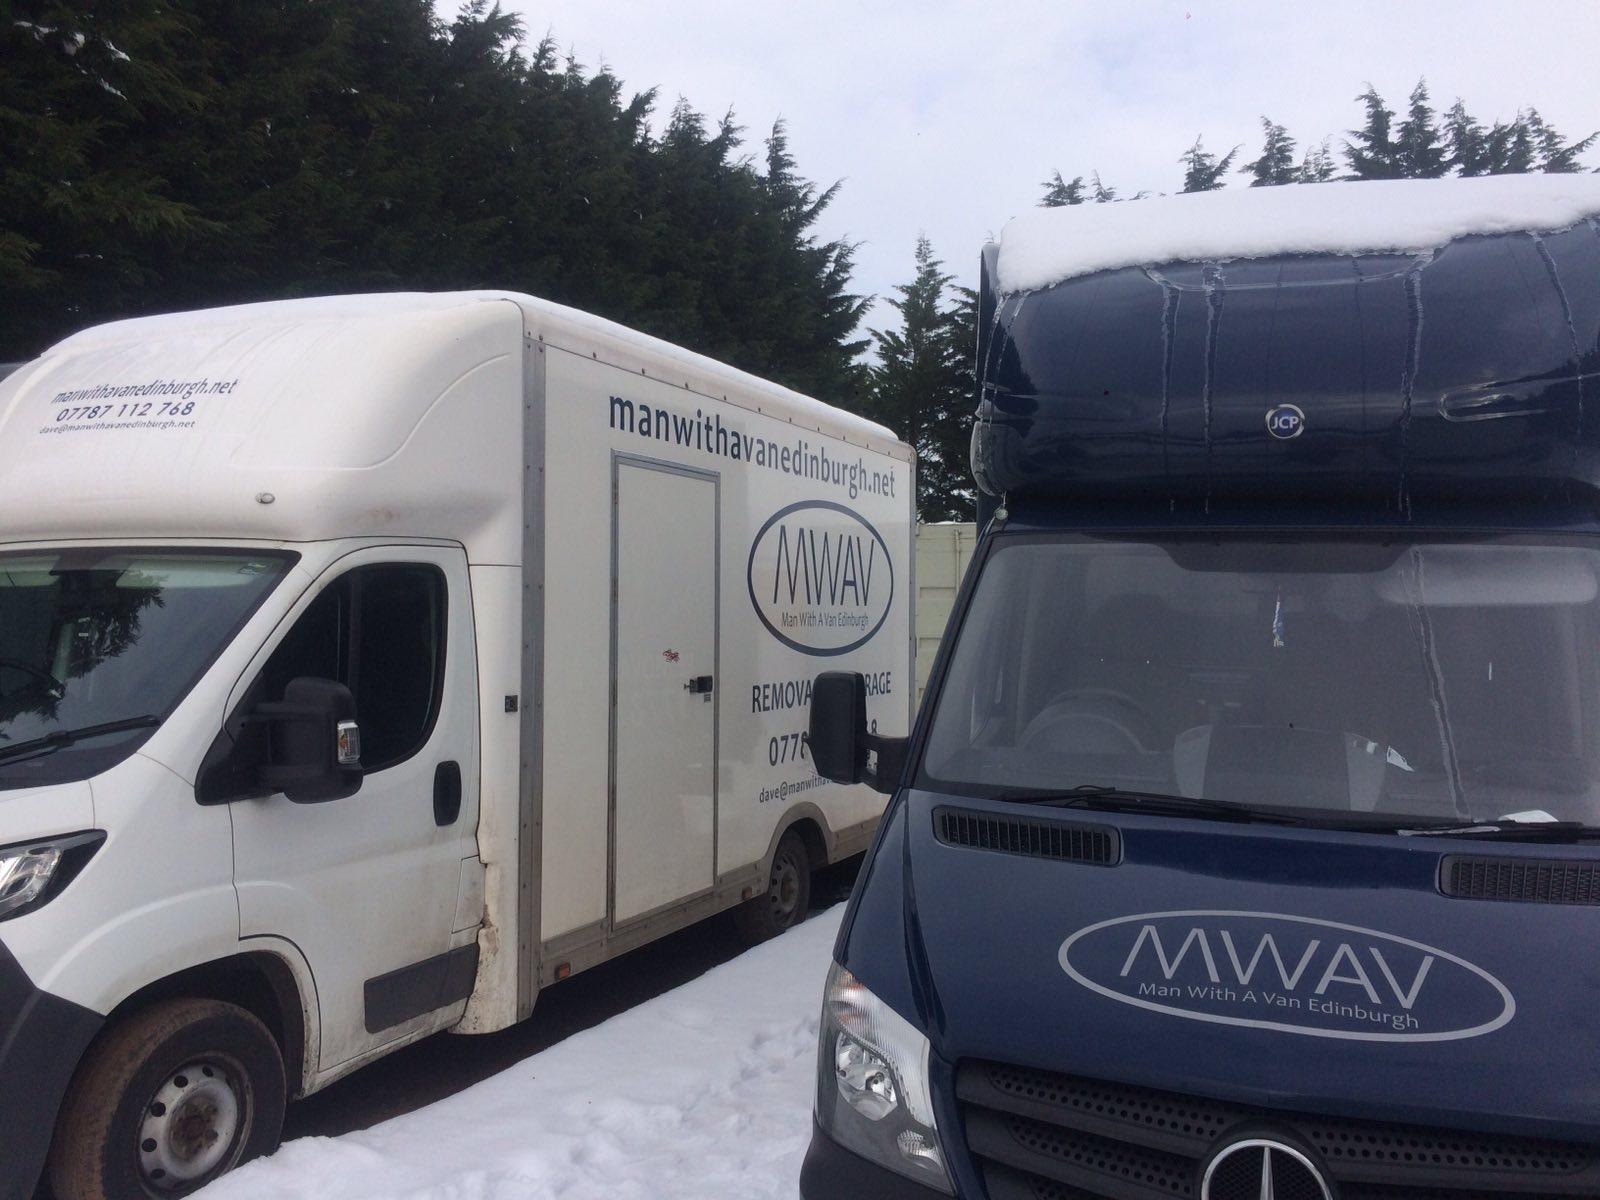 man with a van Edinburgh parked